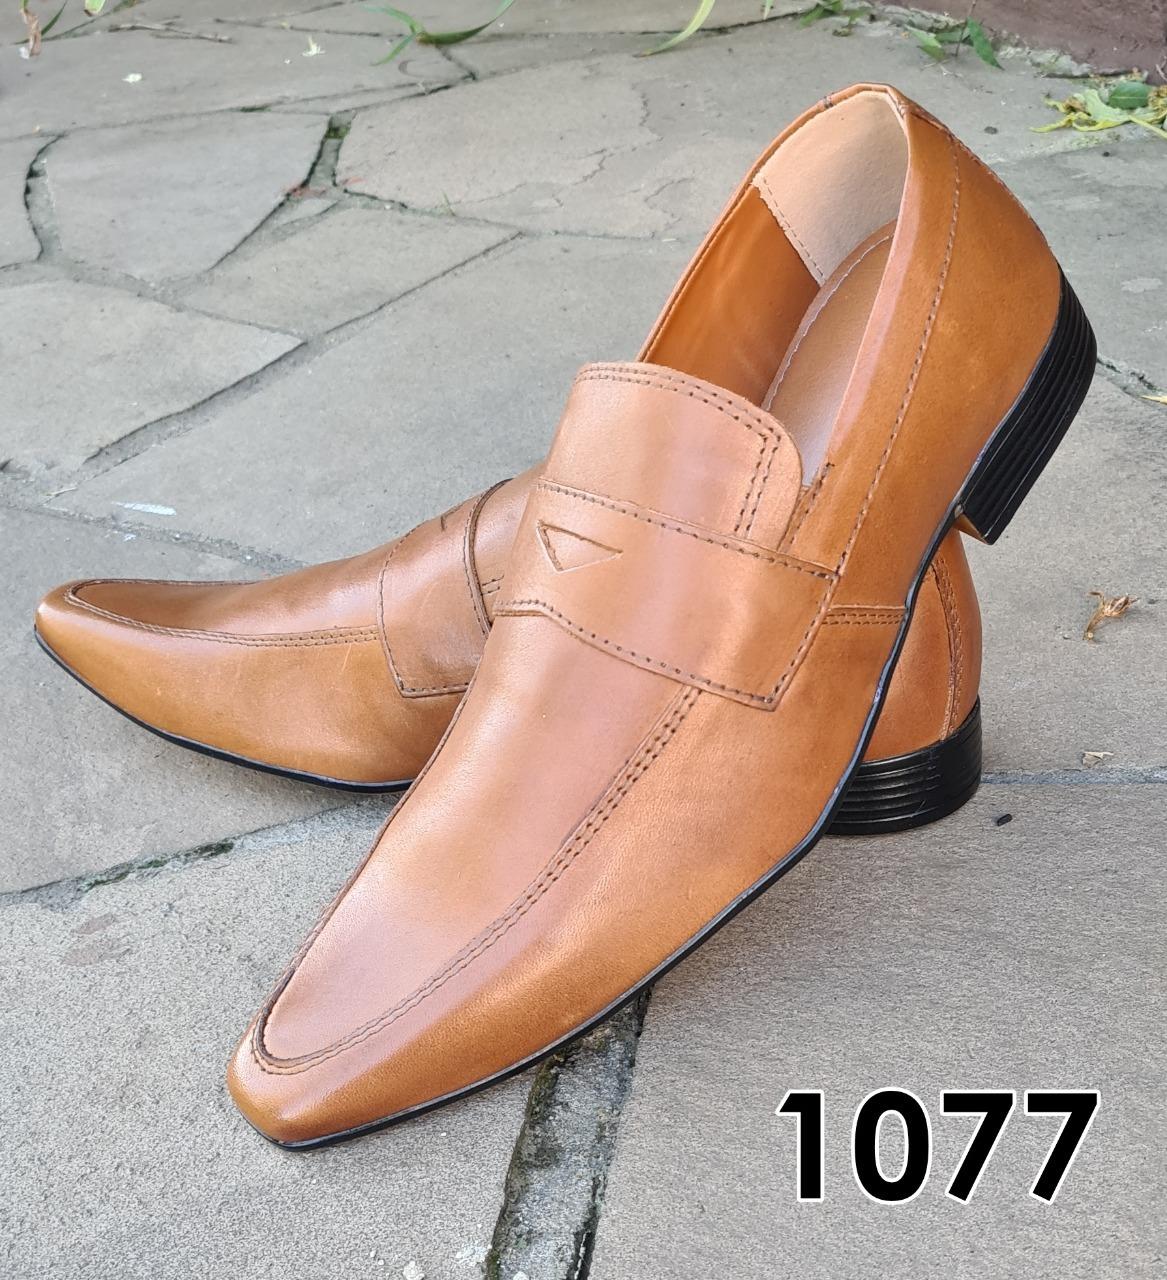 mocassim ou loafers